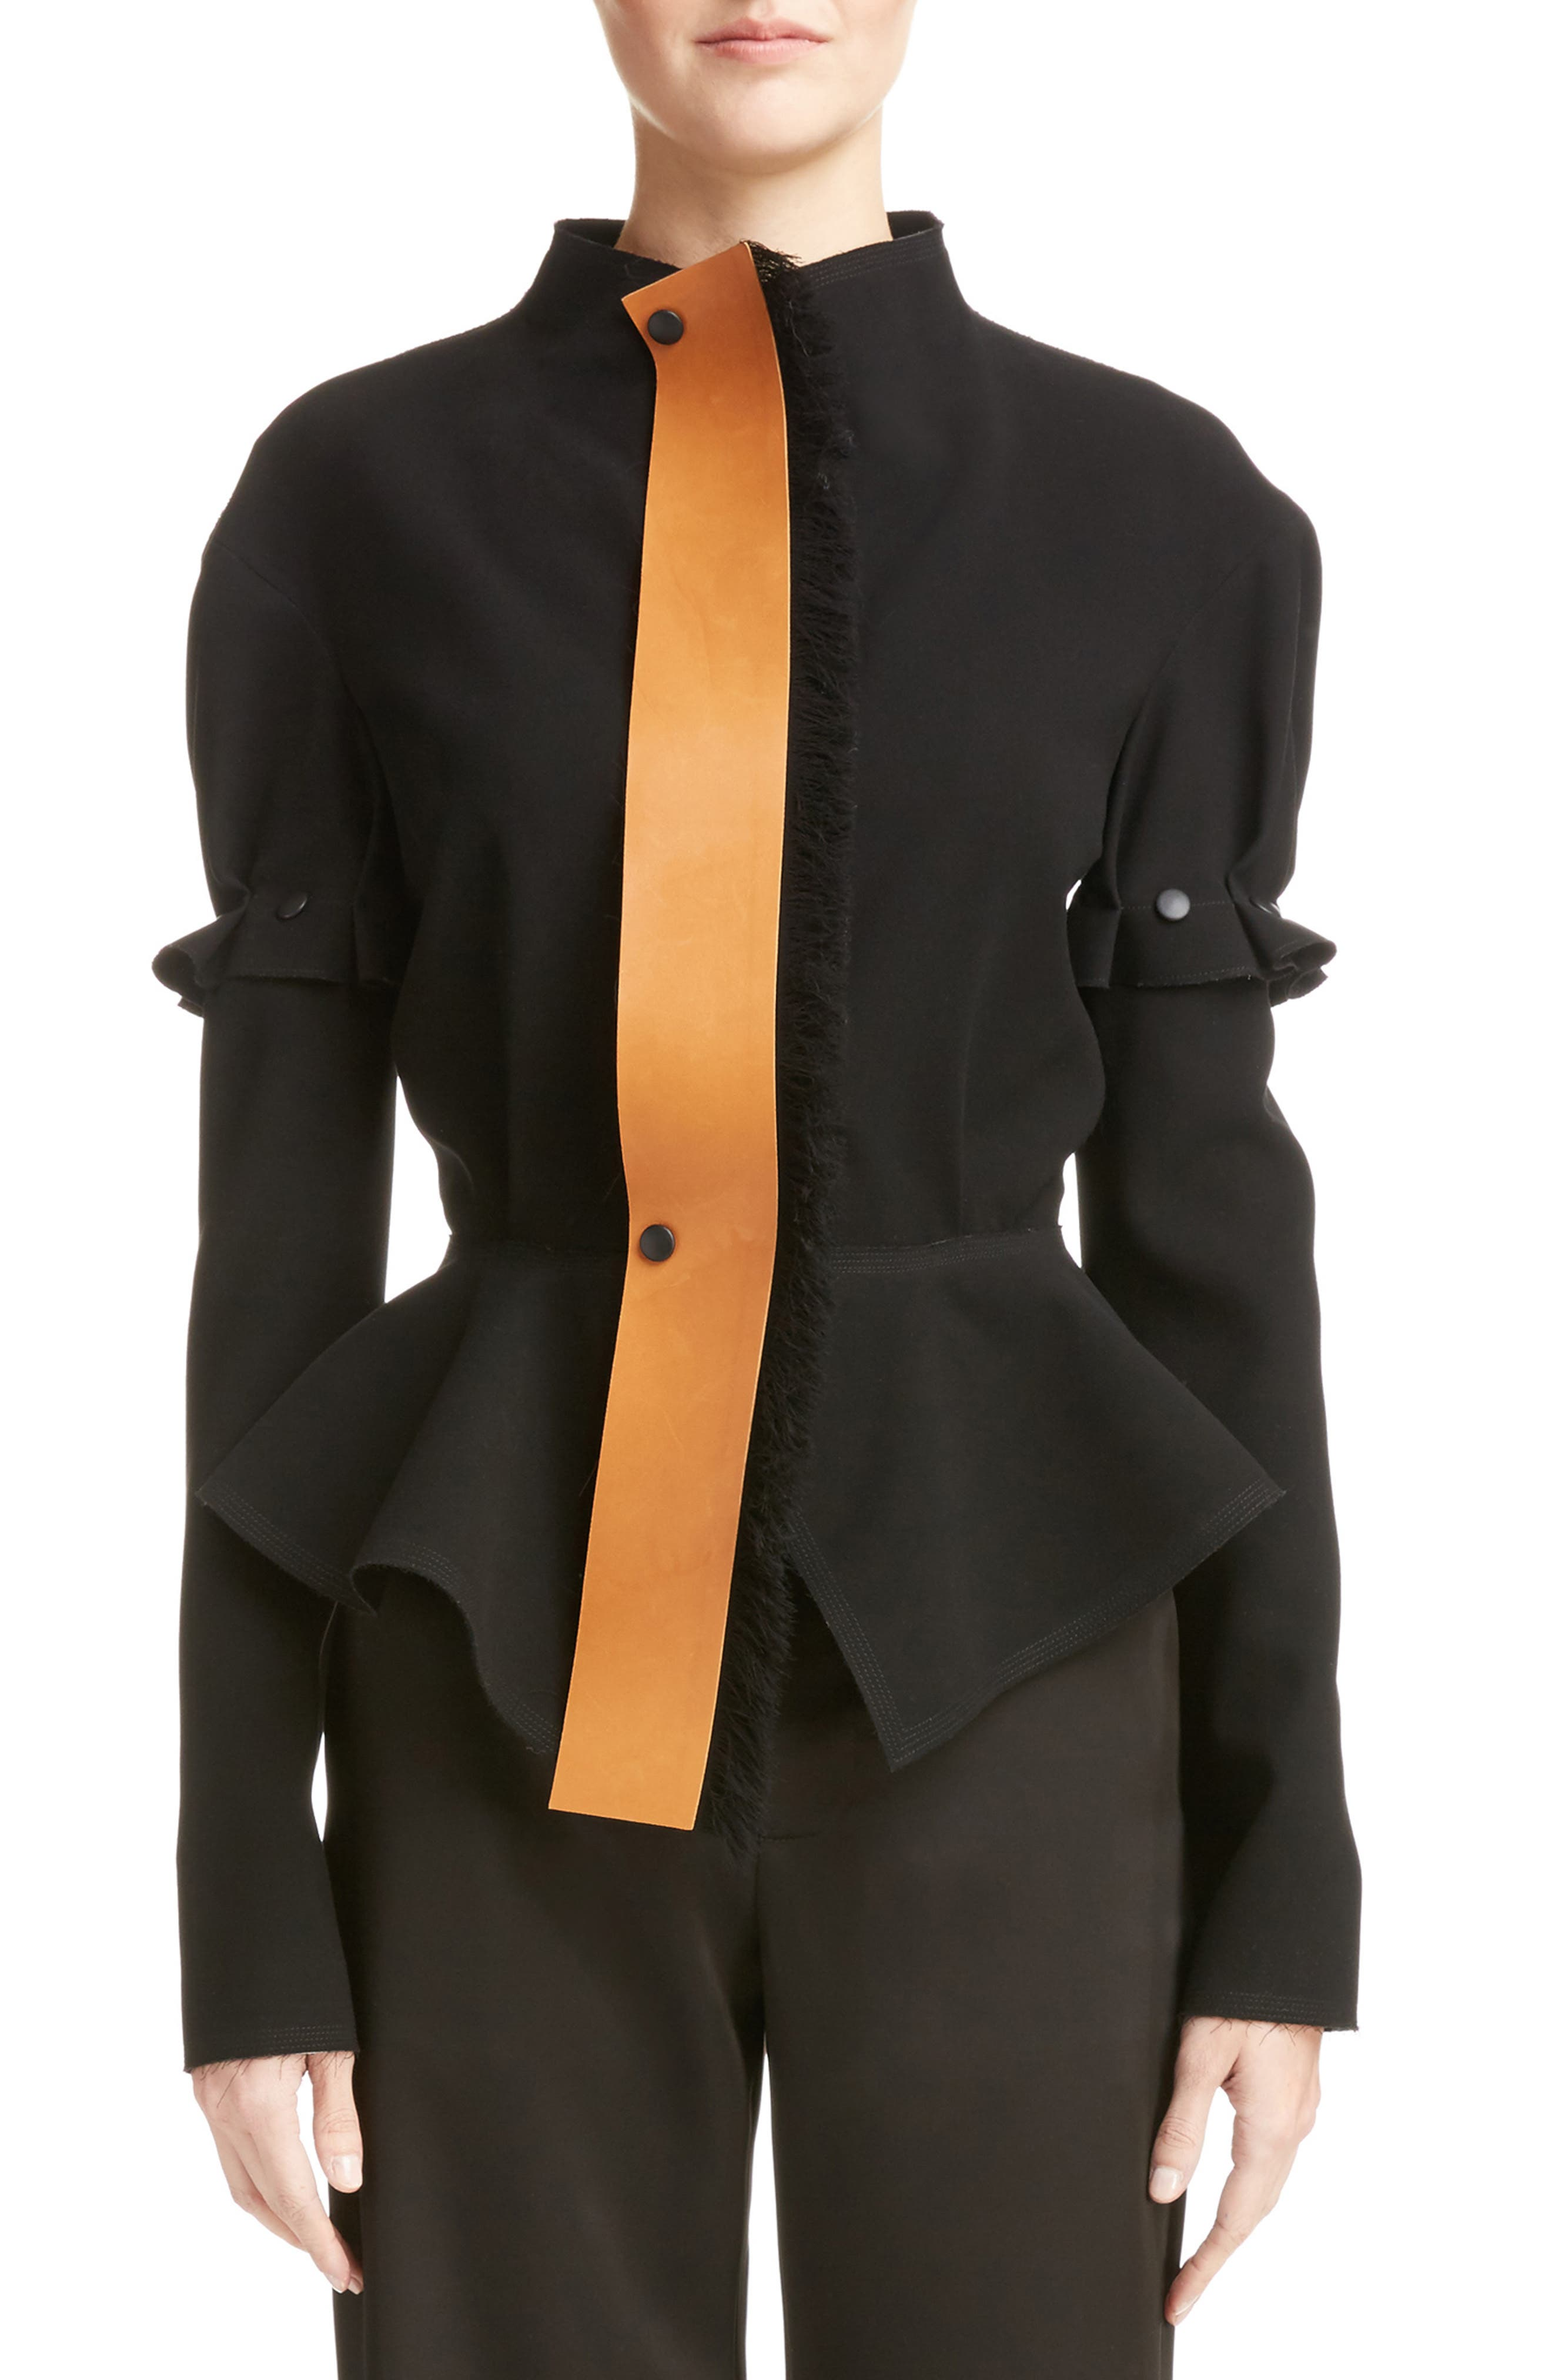 Loewe Crepe Jacket with Detachable Leather Placket & Sleeves